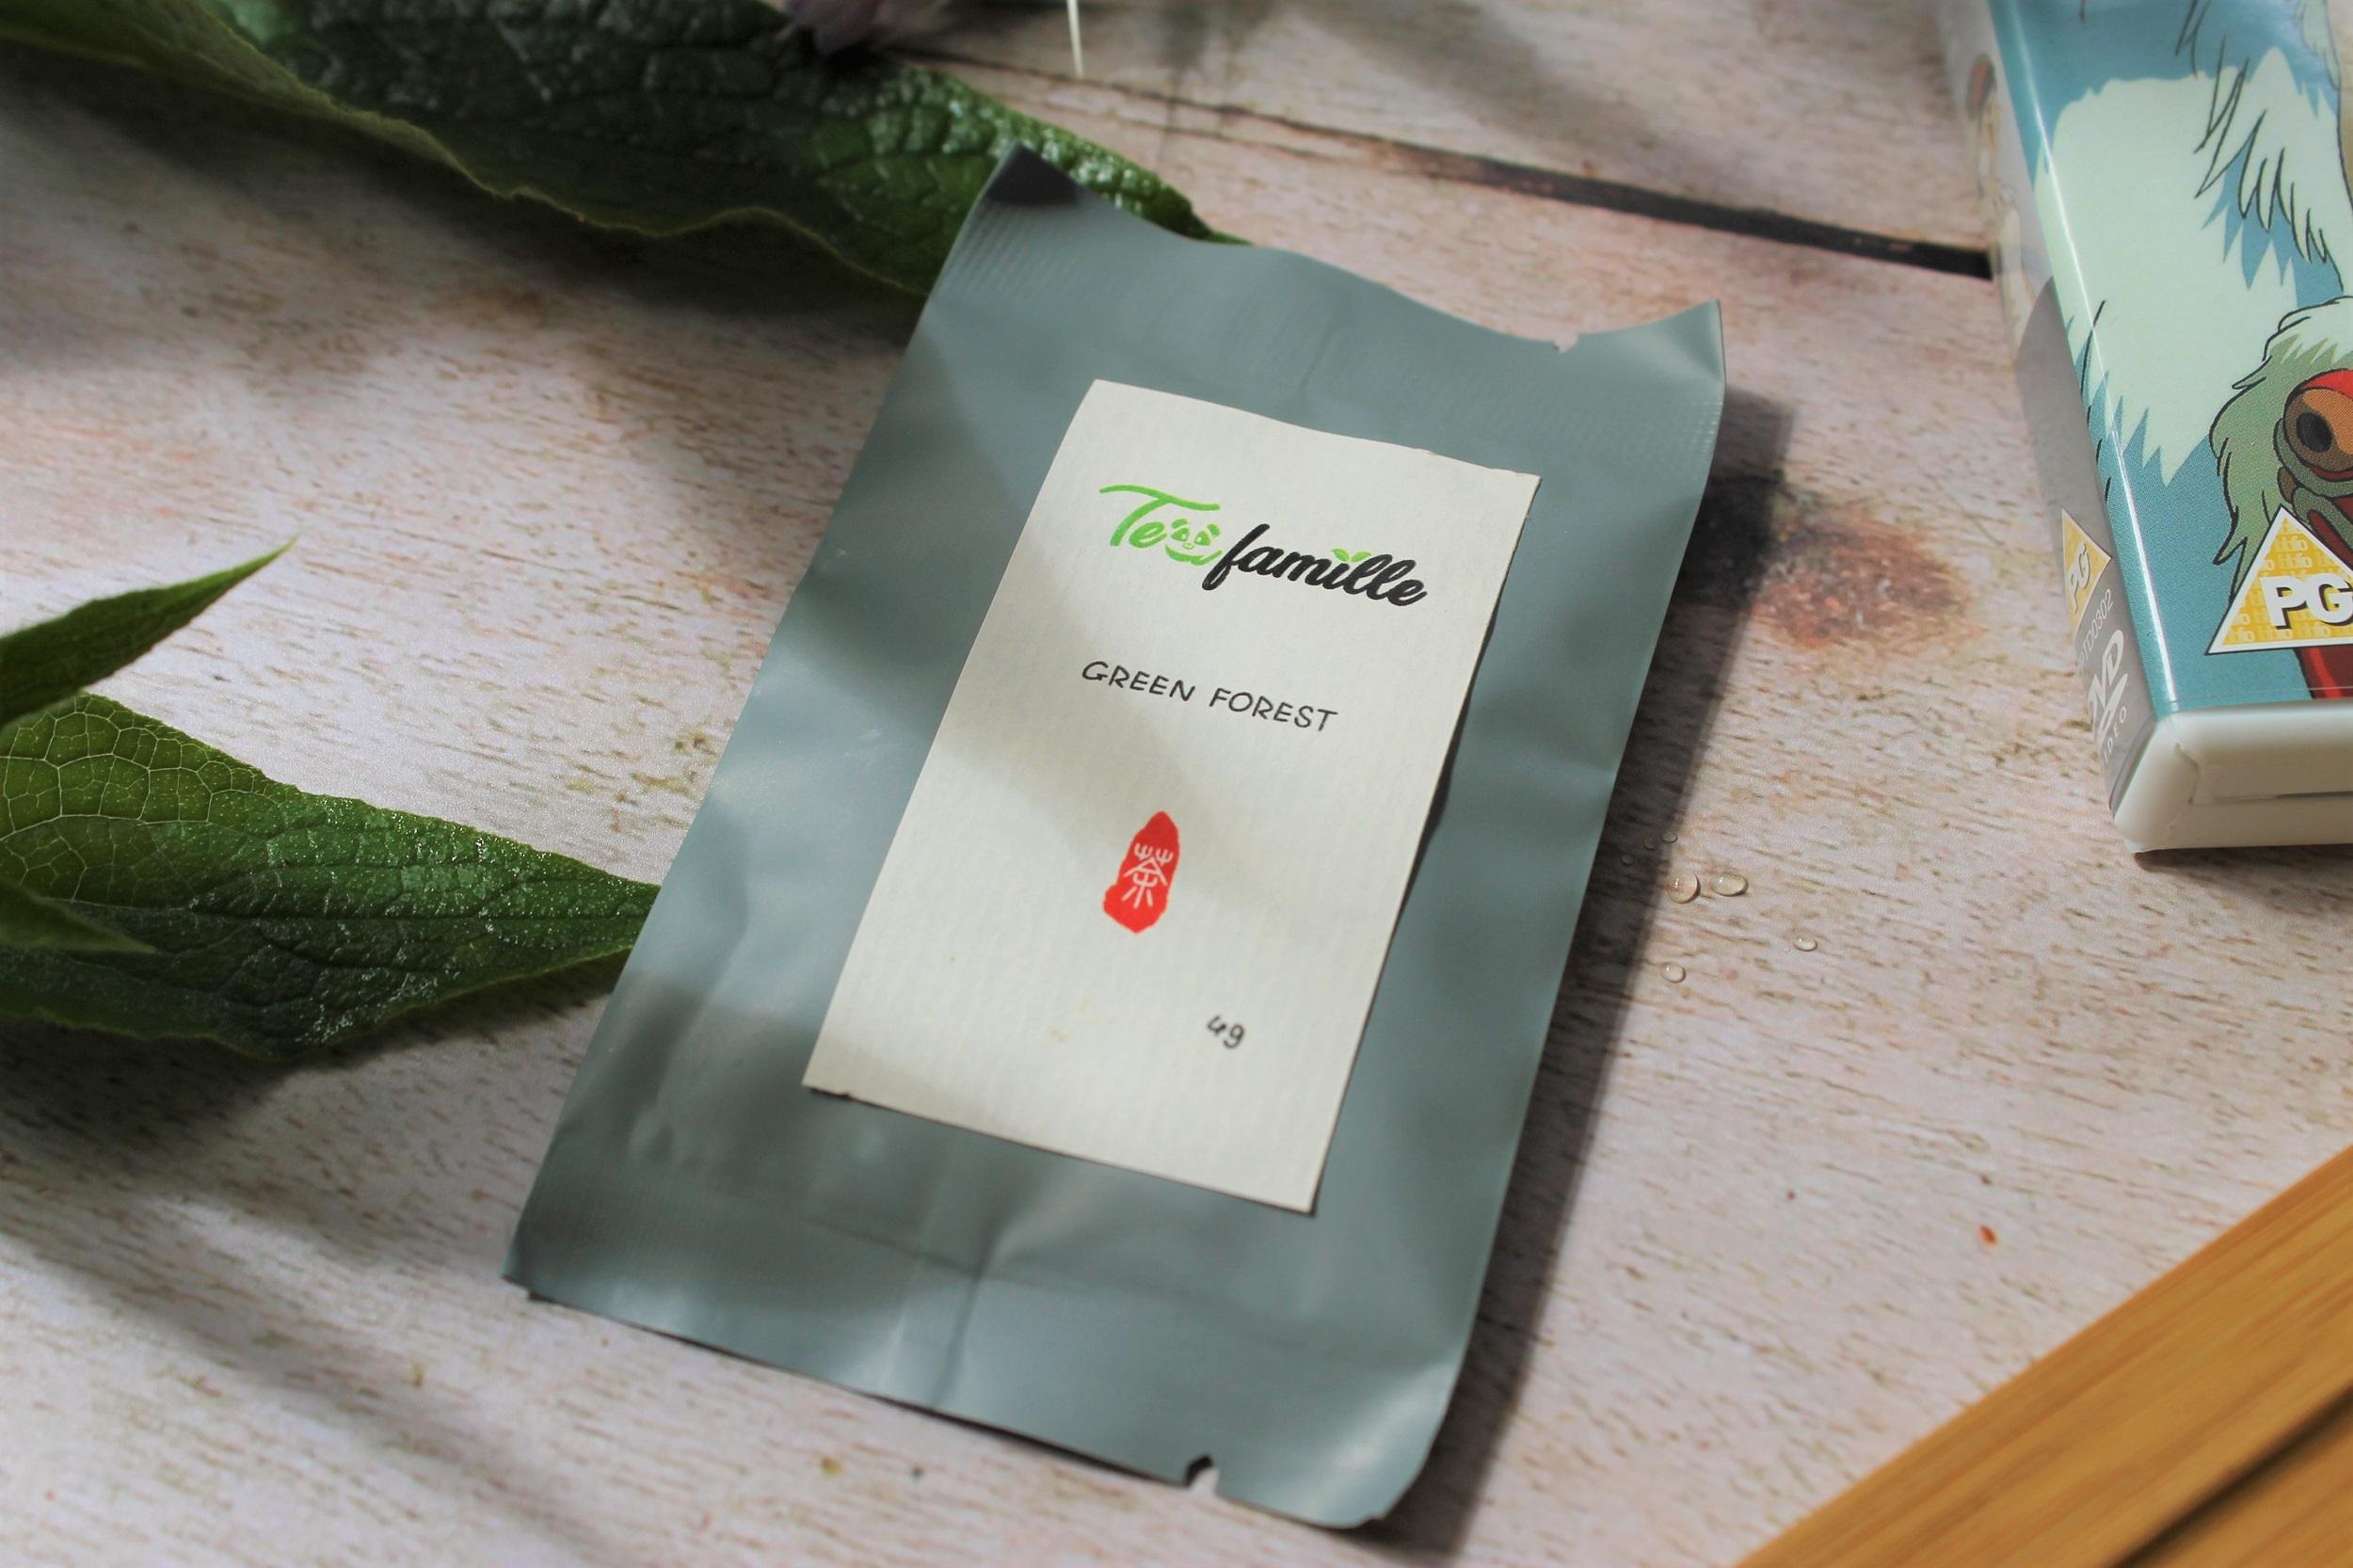 tea famille green forest loose leaf tea package